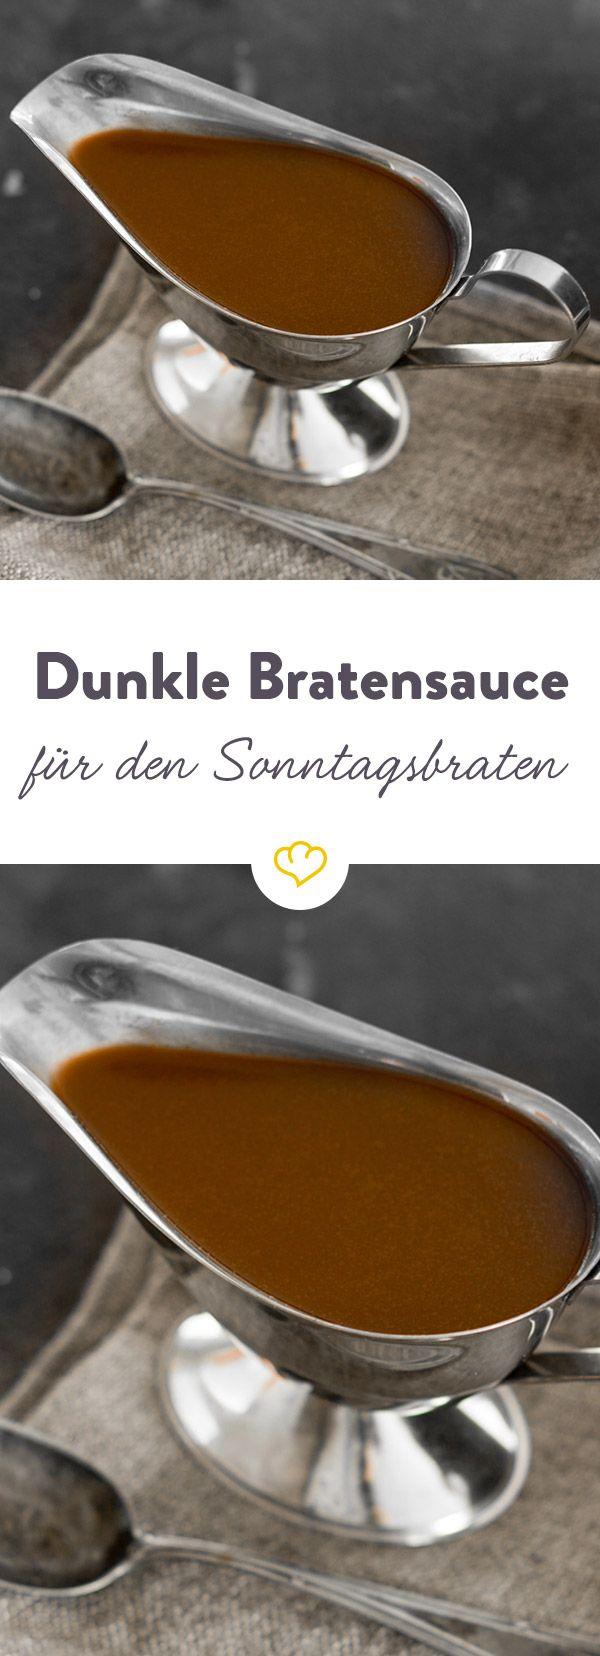 Dunkle Bratensauce